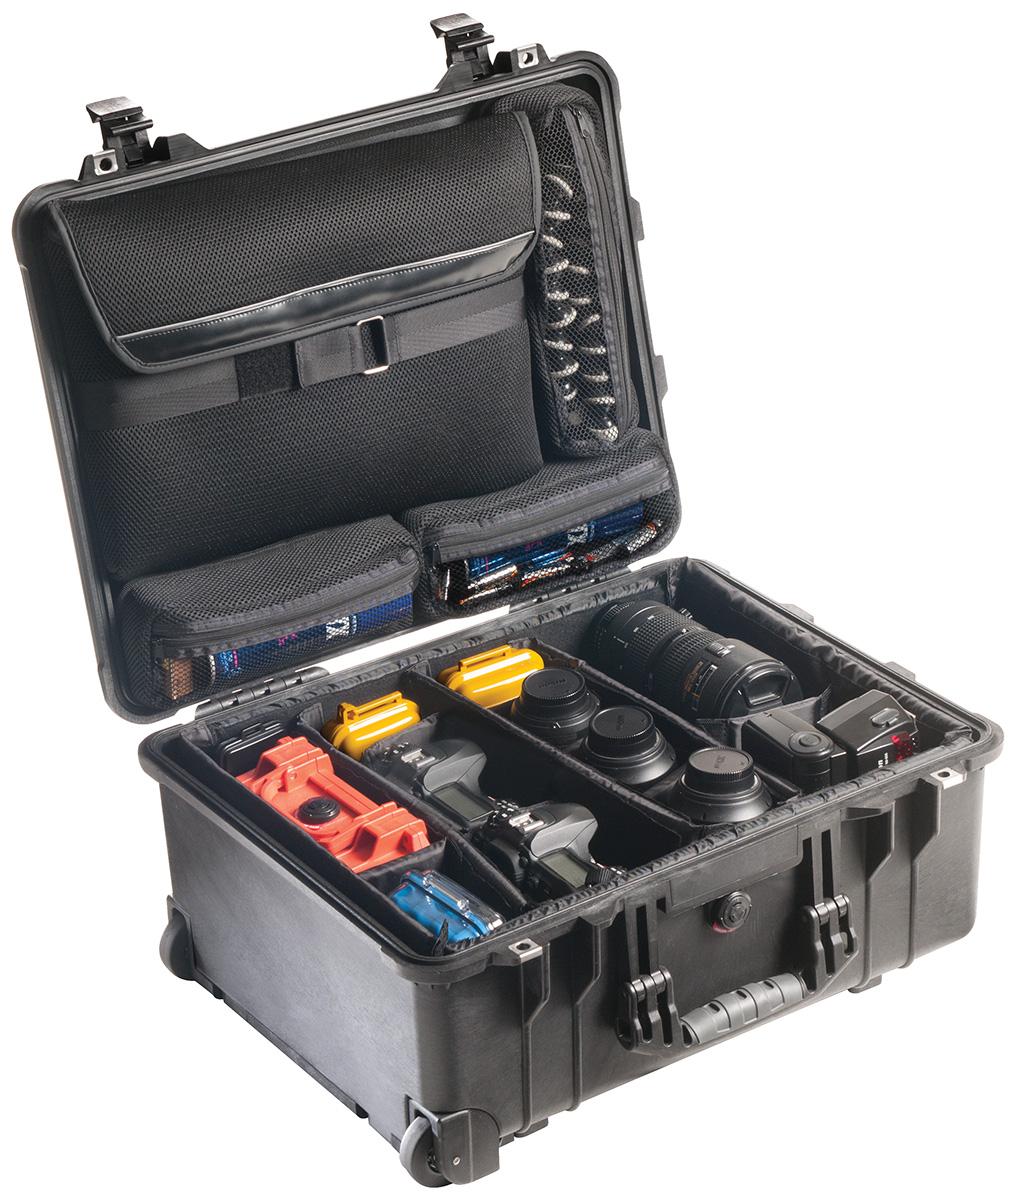 pelican-protographer-camera-lens-case.jpg